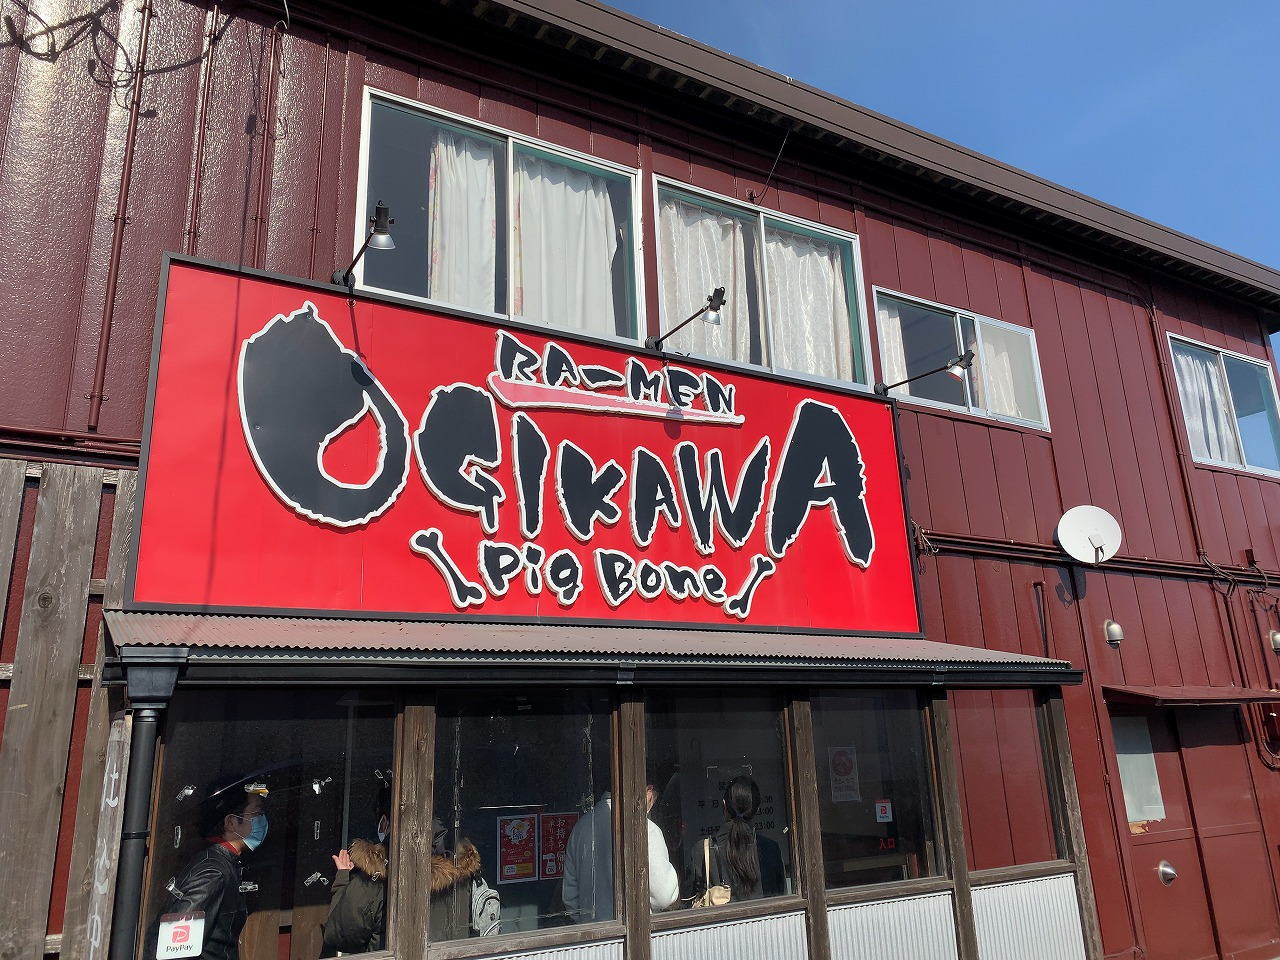 RA-MEN OGIKAWA 亀田店(らーめん おぎかわ 亀田店)